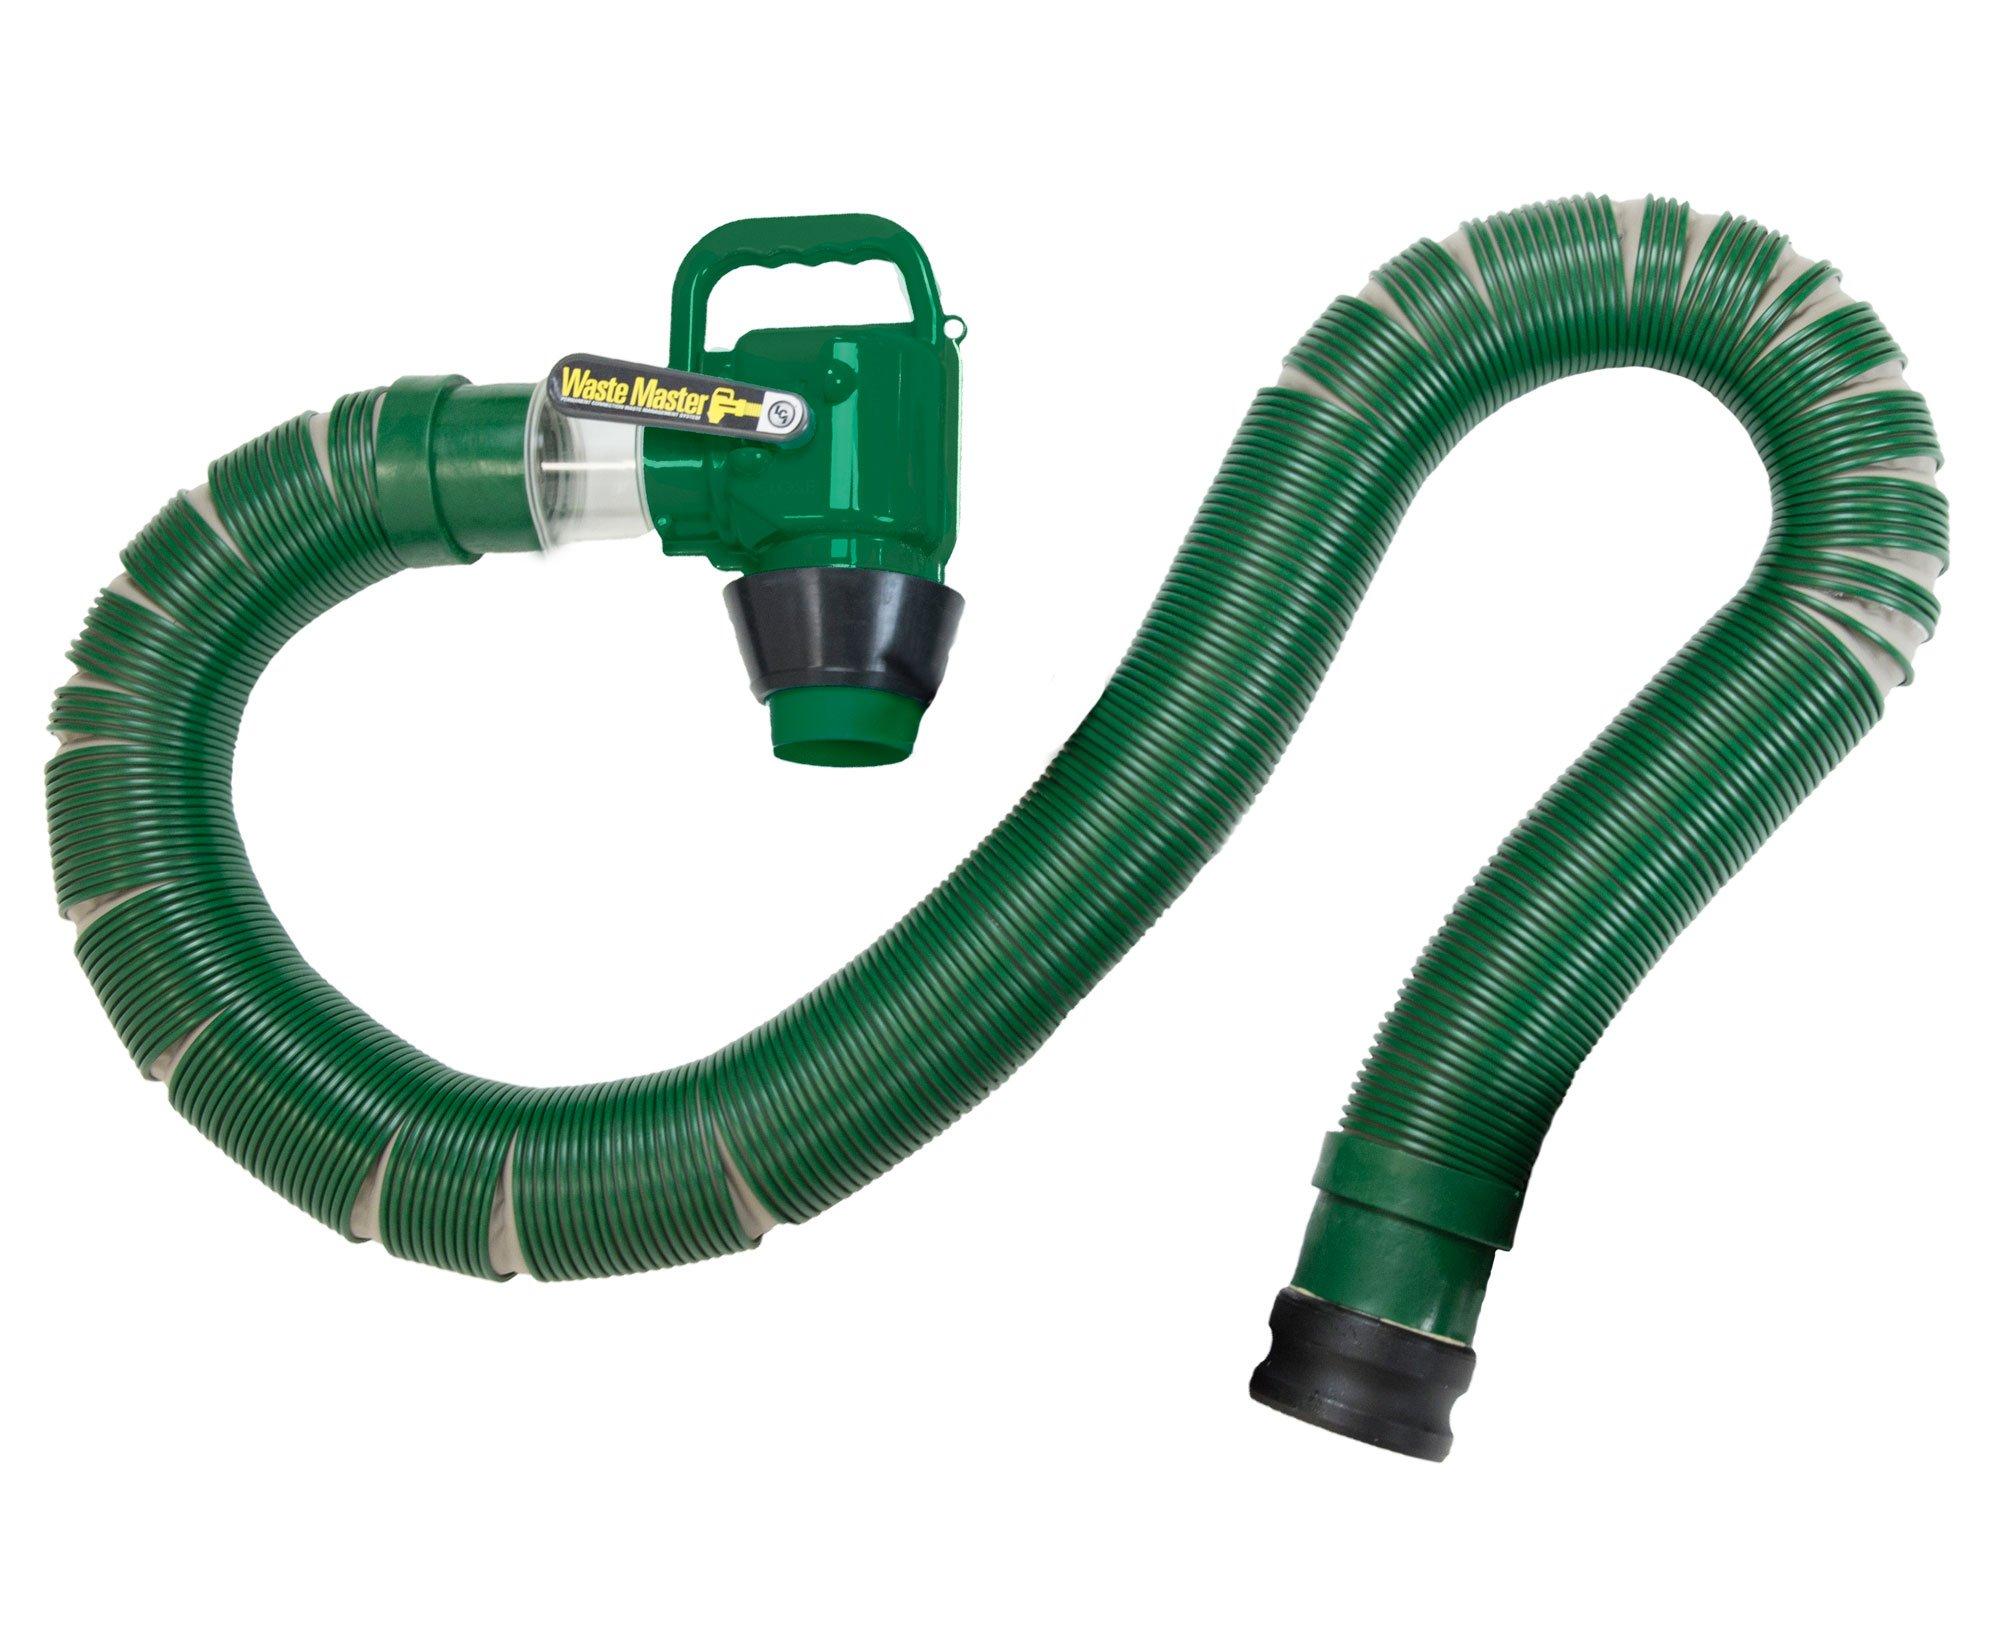 Lippert 359724 Waste Master 20' Extended RV Sewer Hose Management System